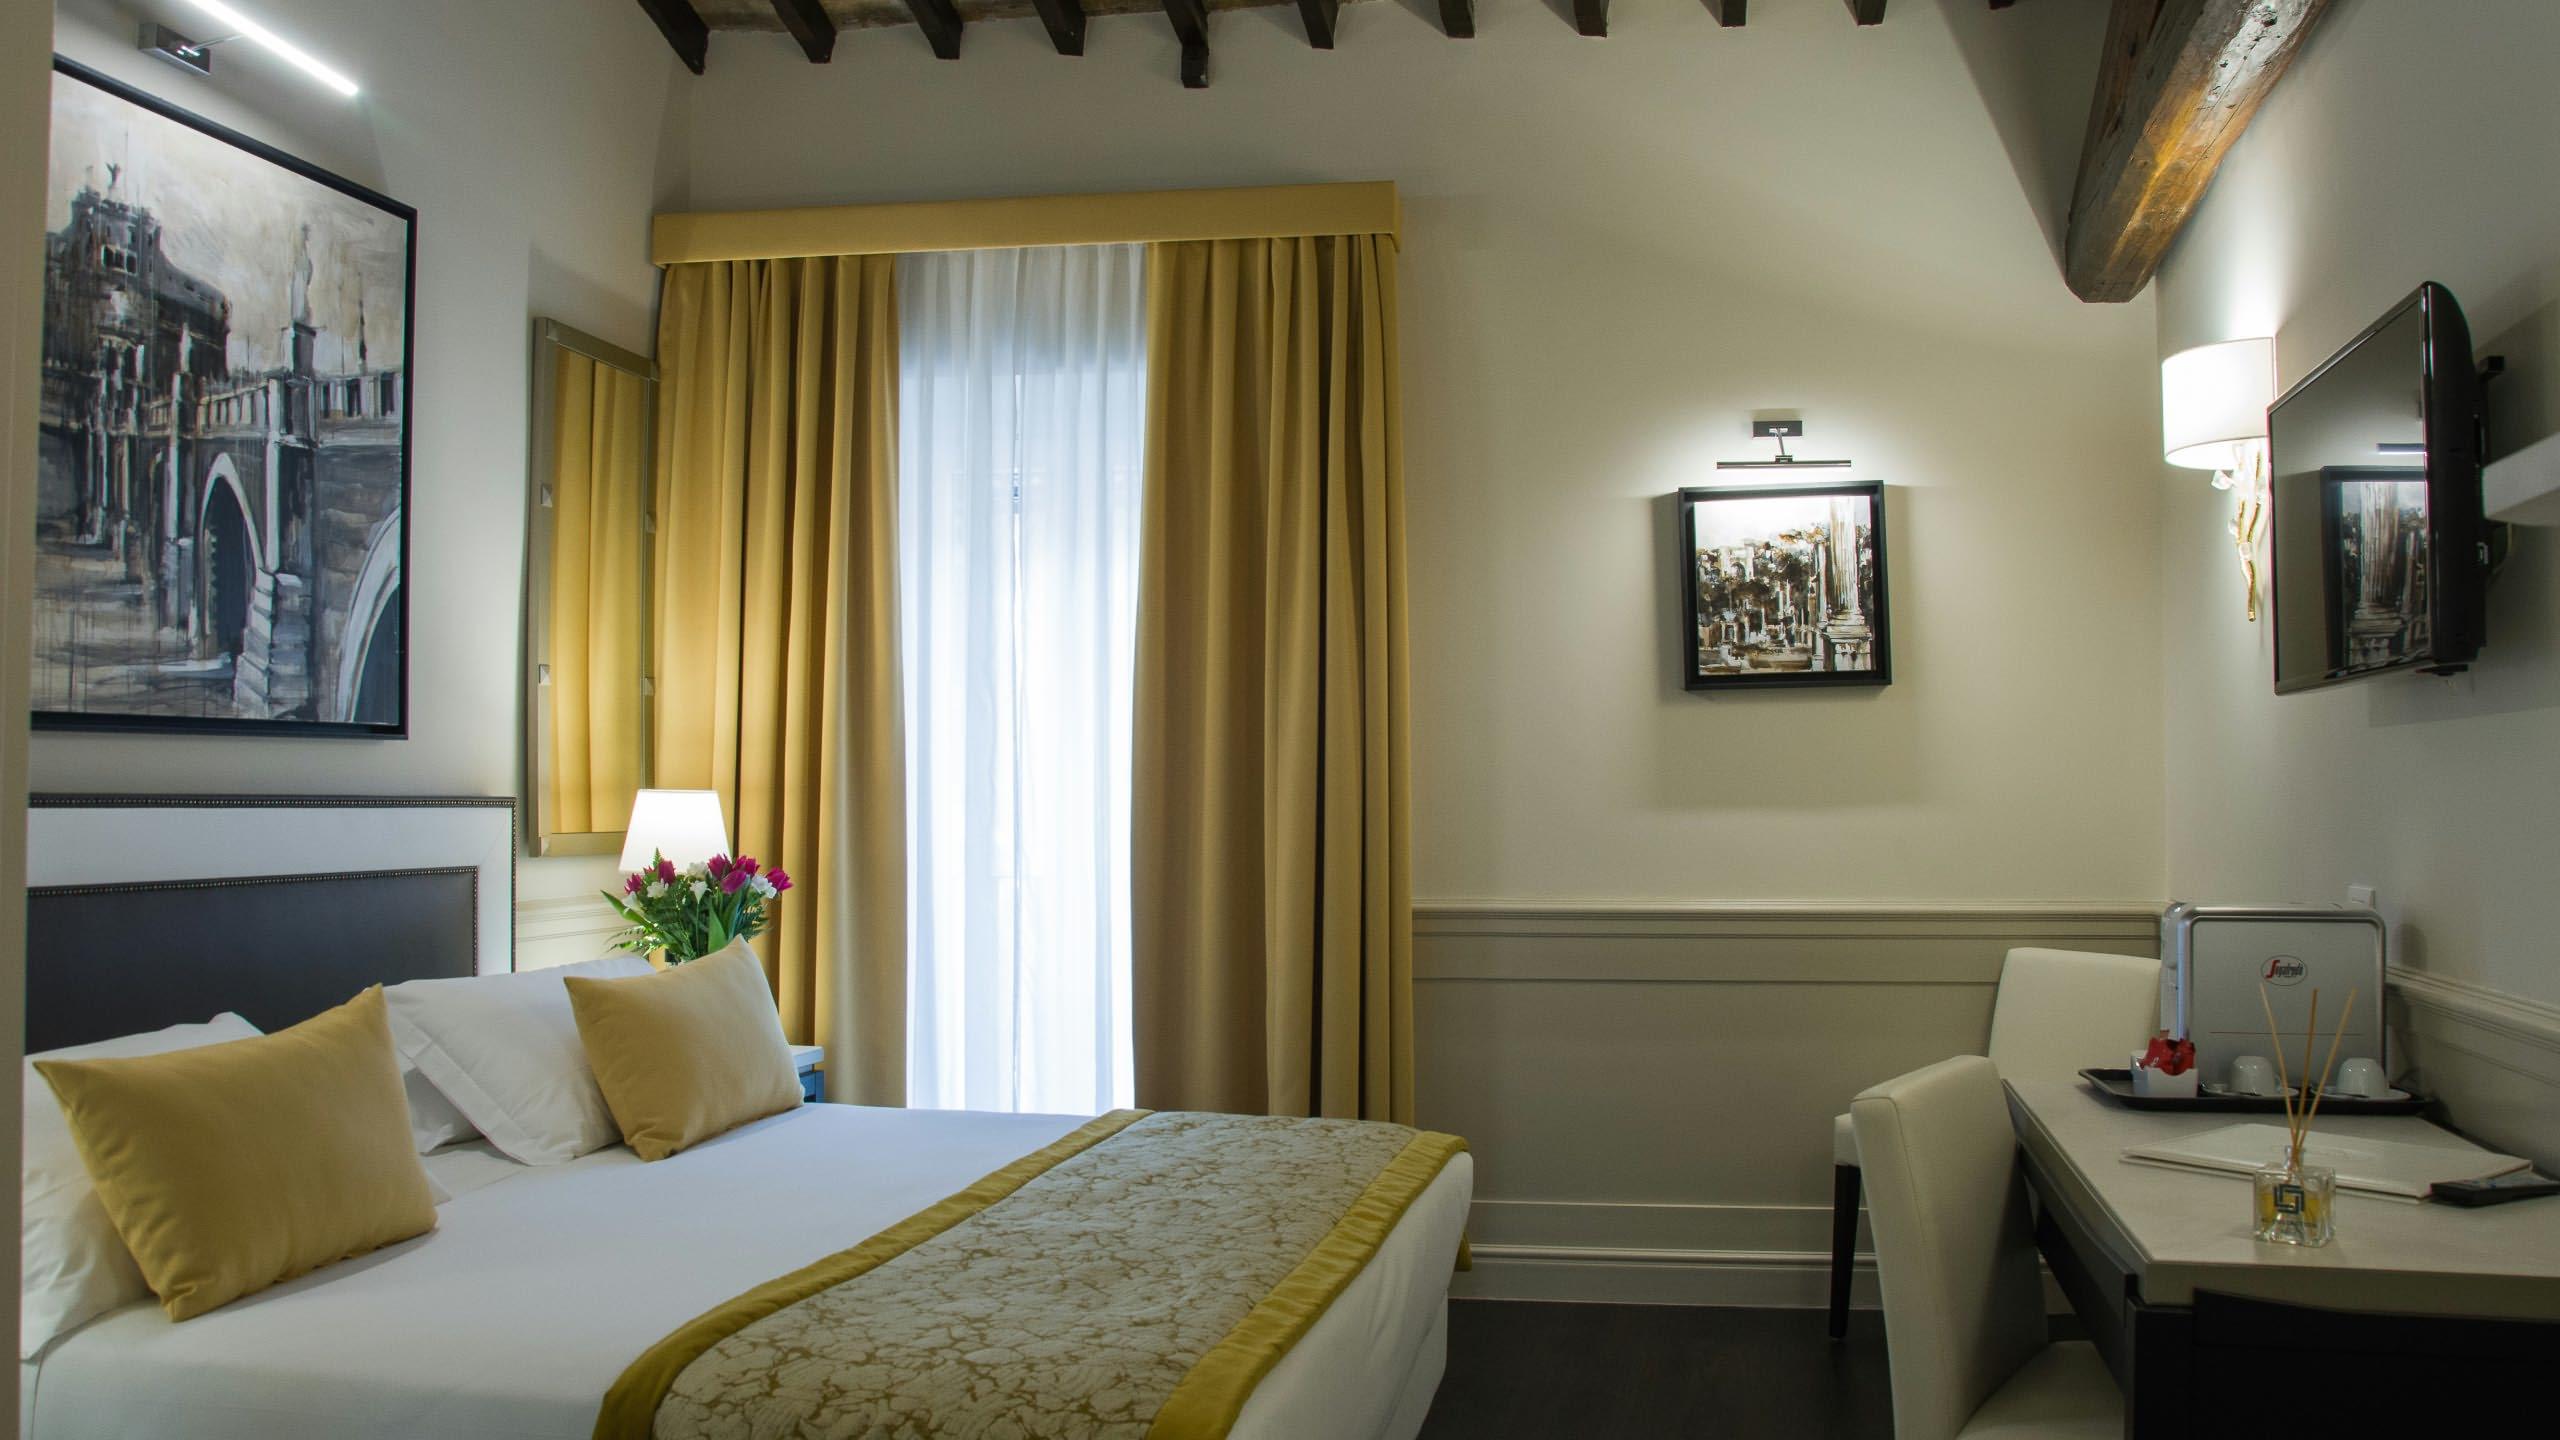 HOTEL-CHIOLO-SALVO-8.jpg